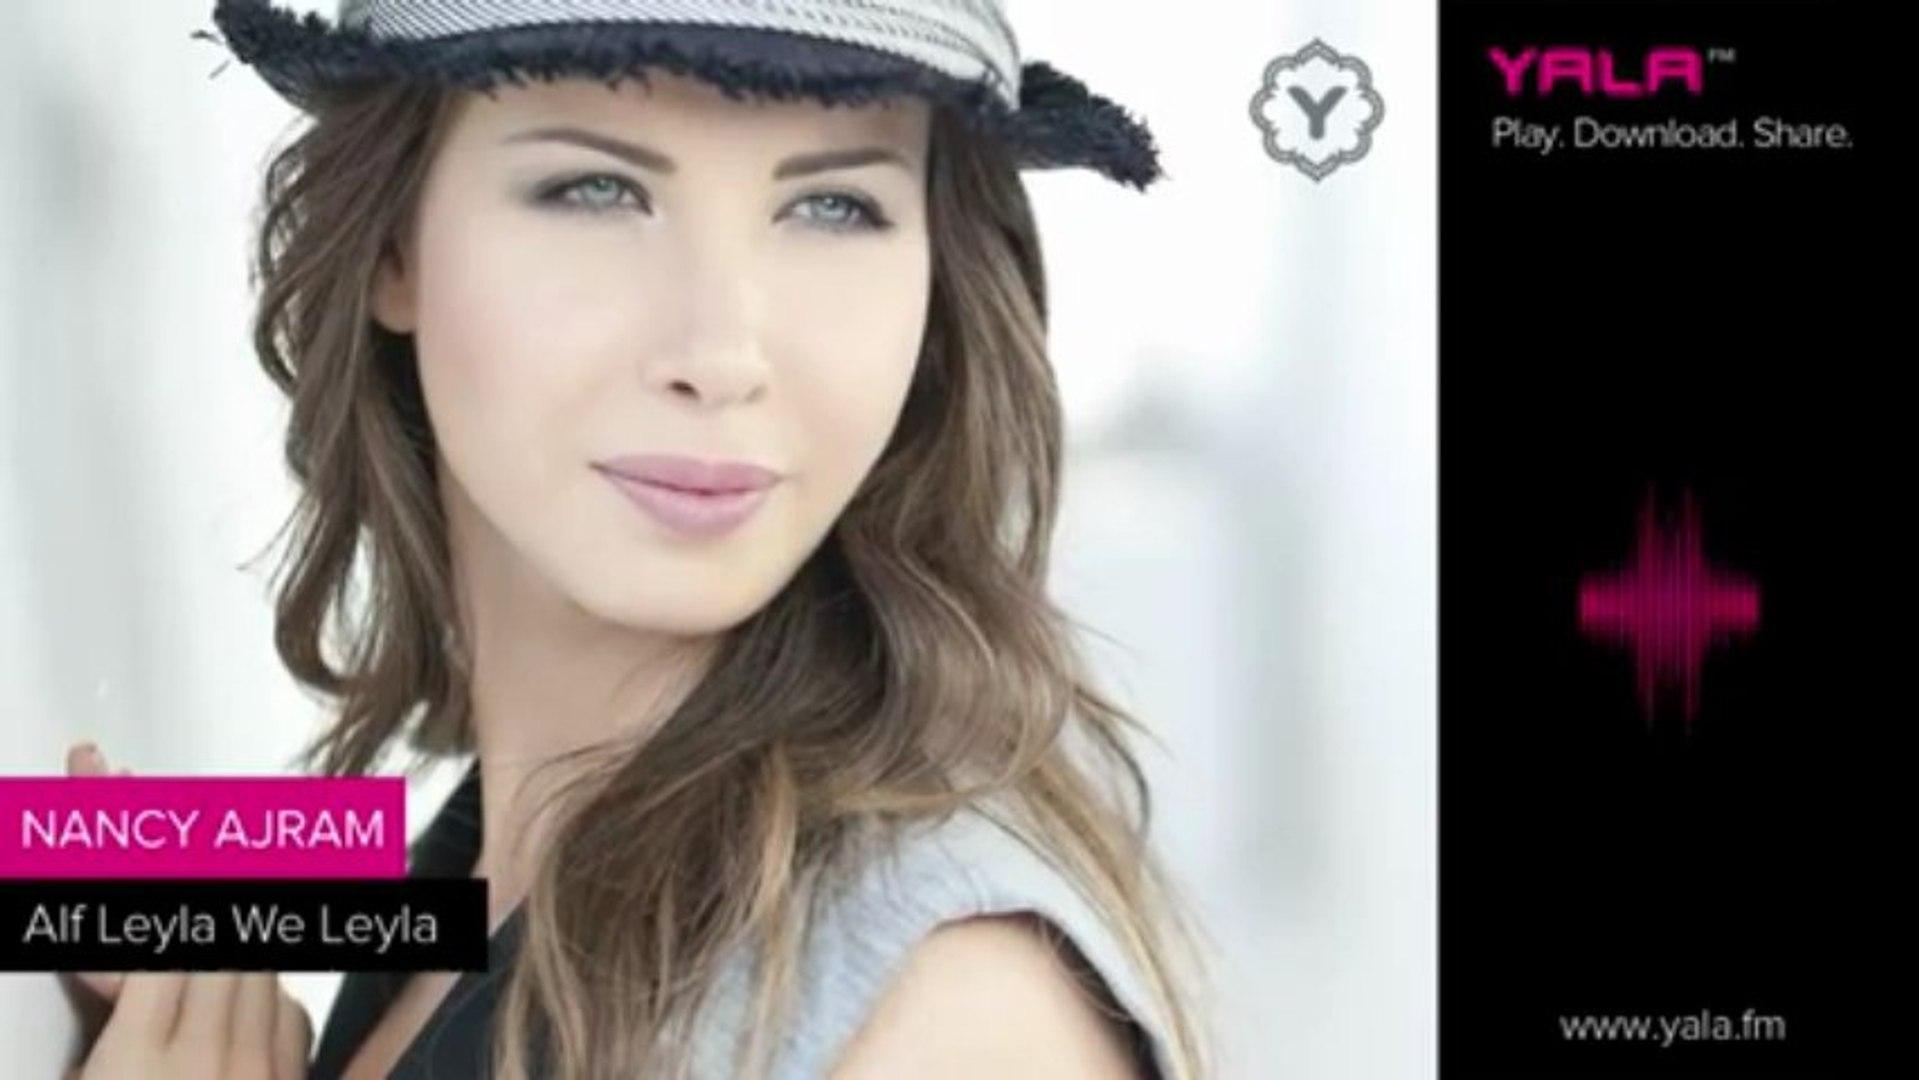 MP3 TÉLÉCHARGER 2013 ABDELWAHAB SHERINE